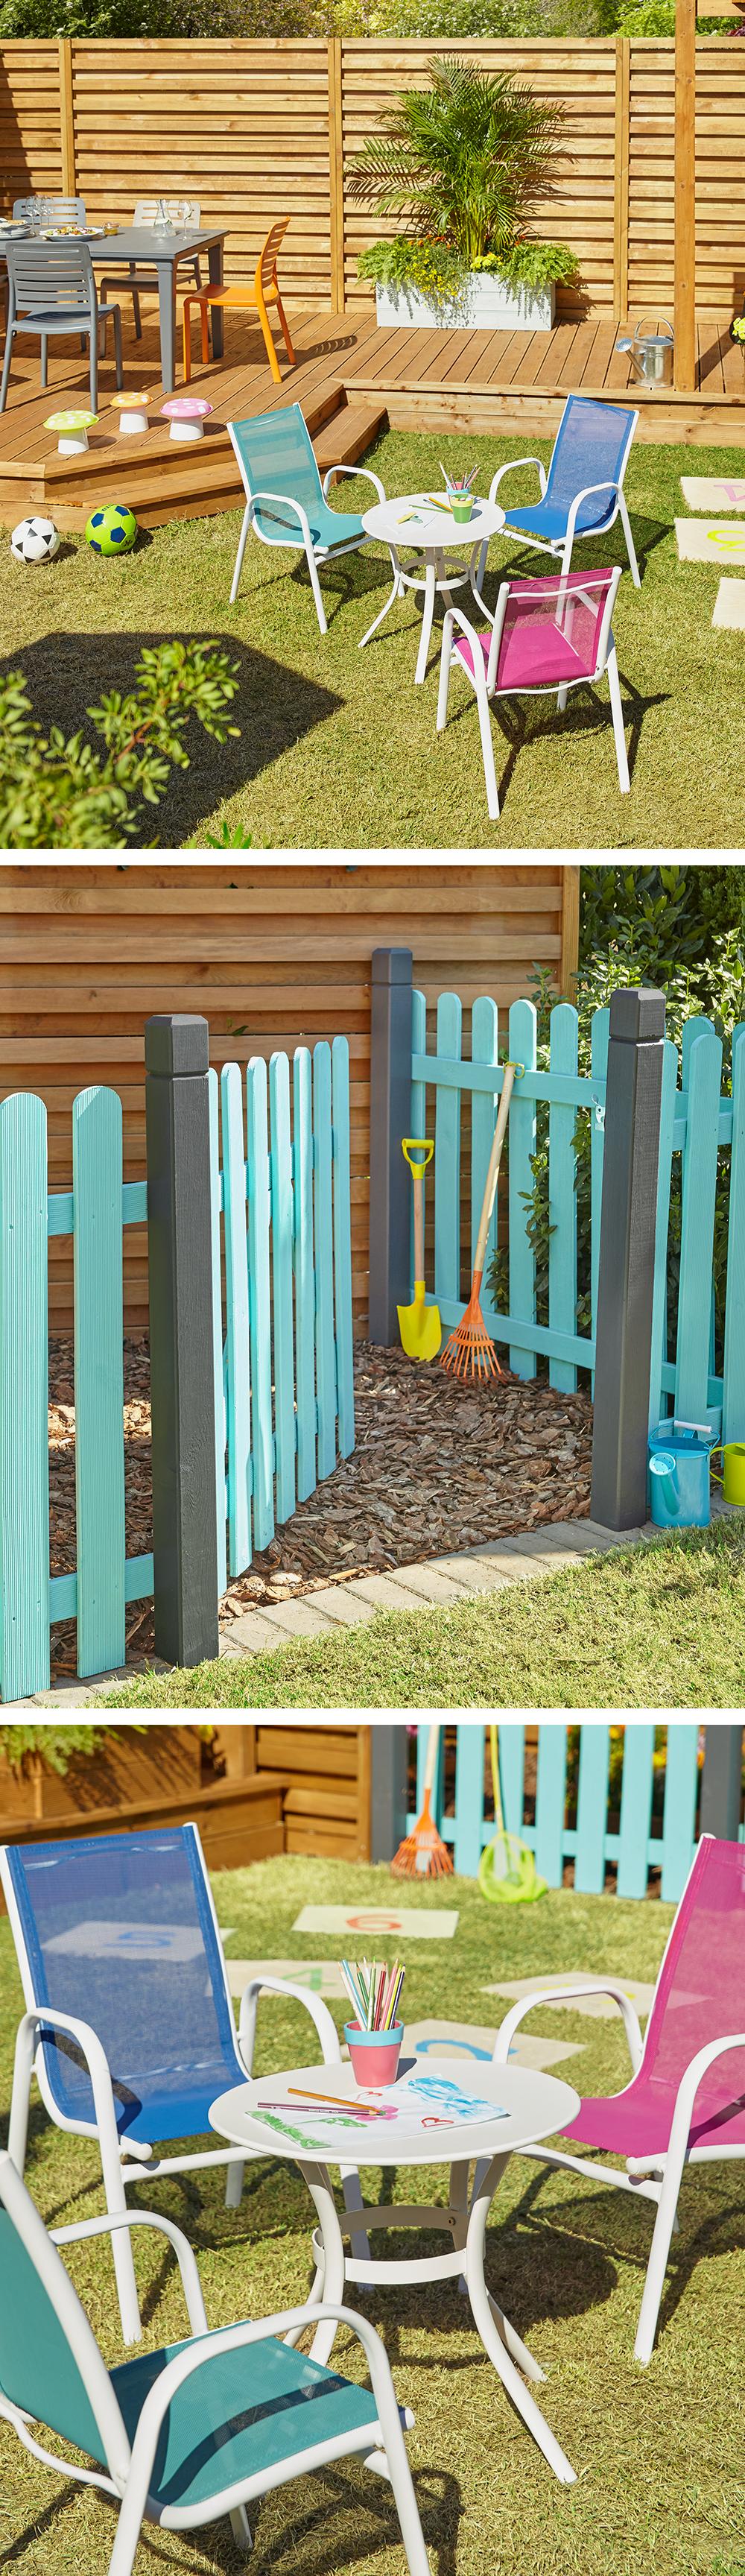 Paint Fences Bright Colours To Section Off A Children S